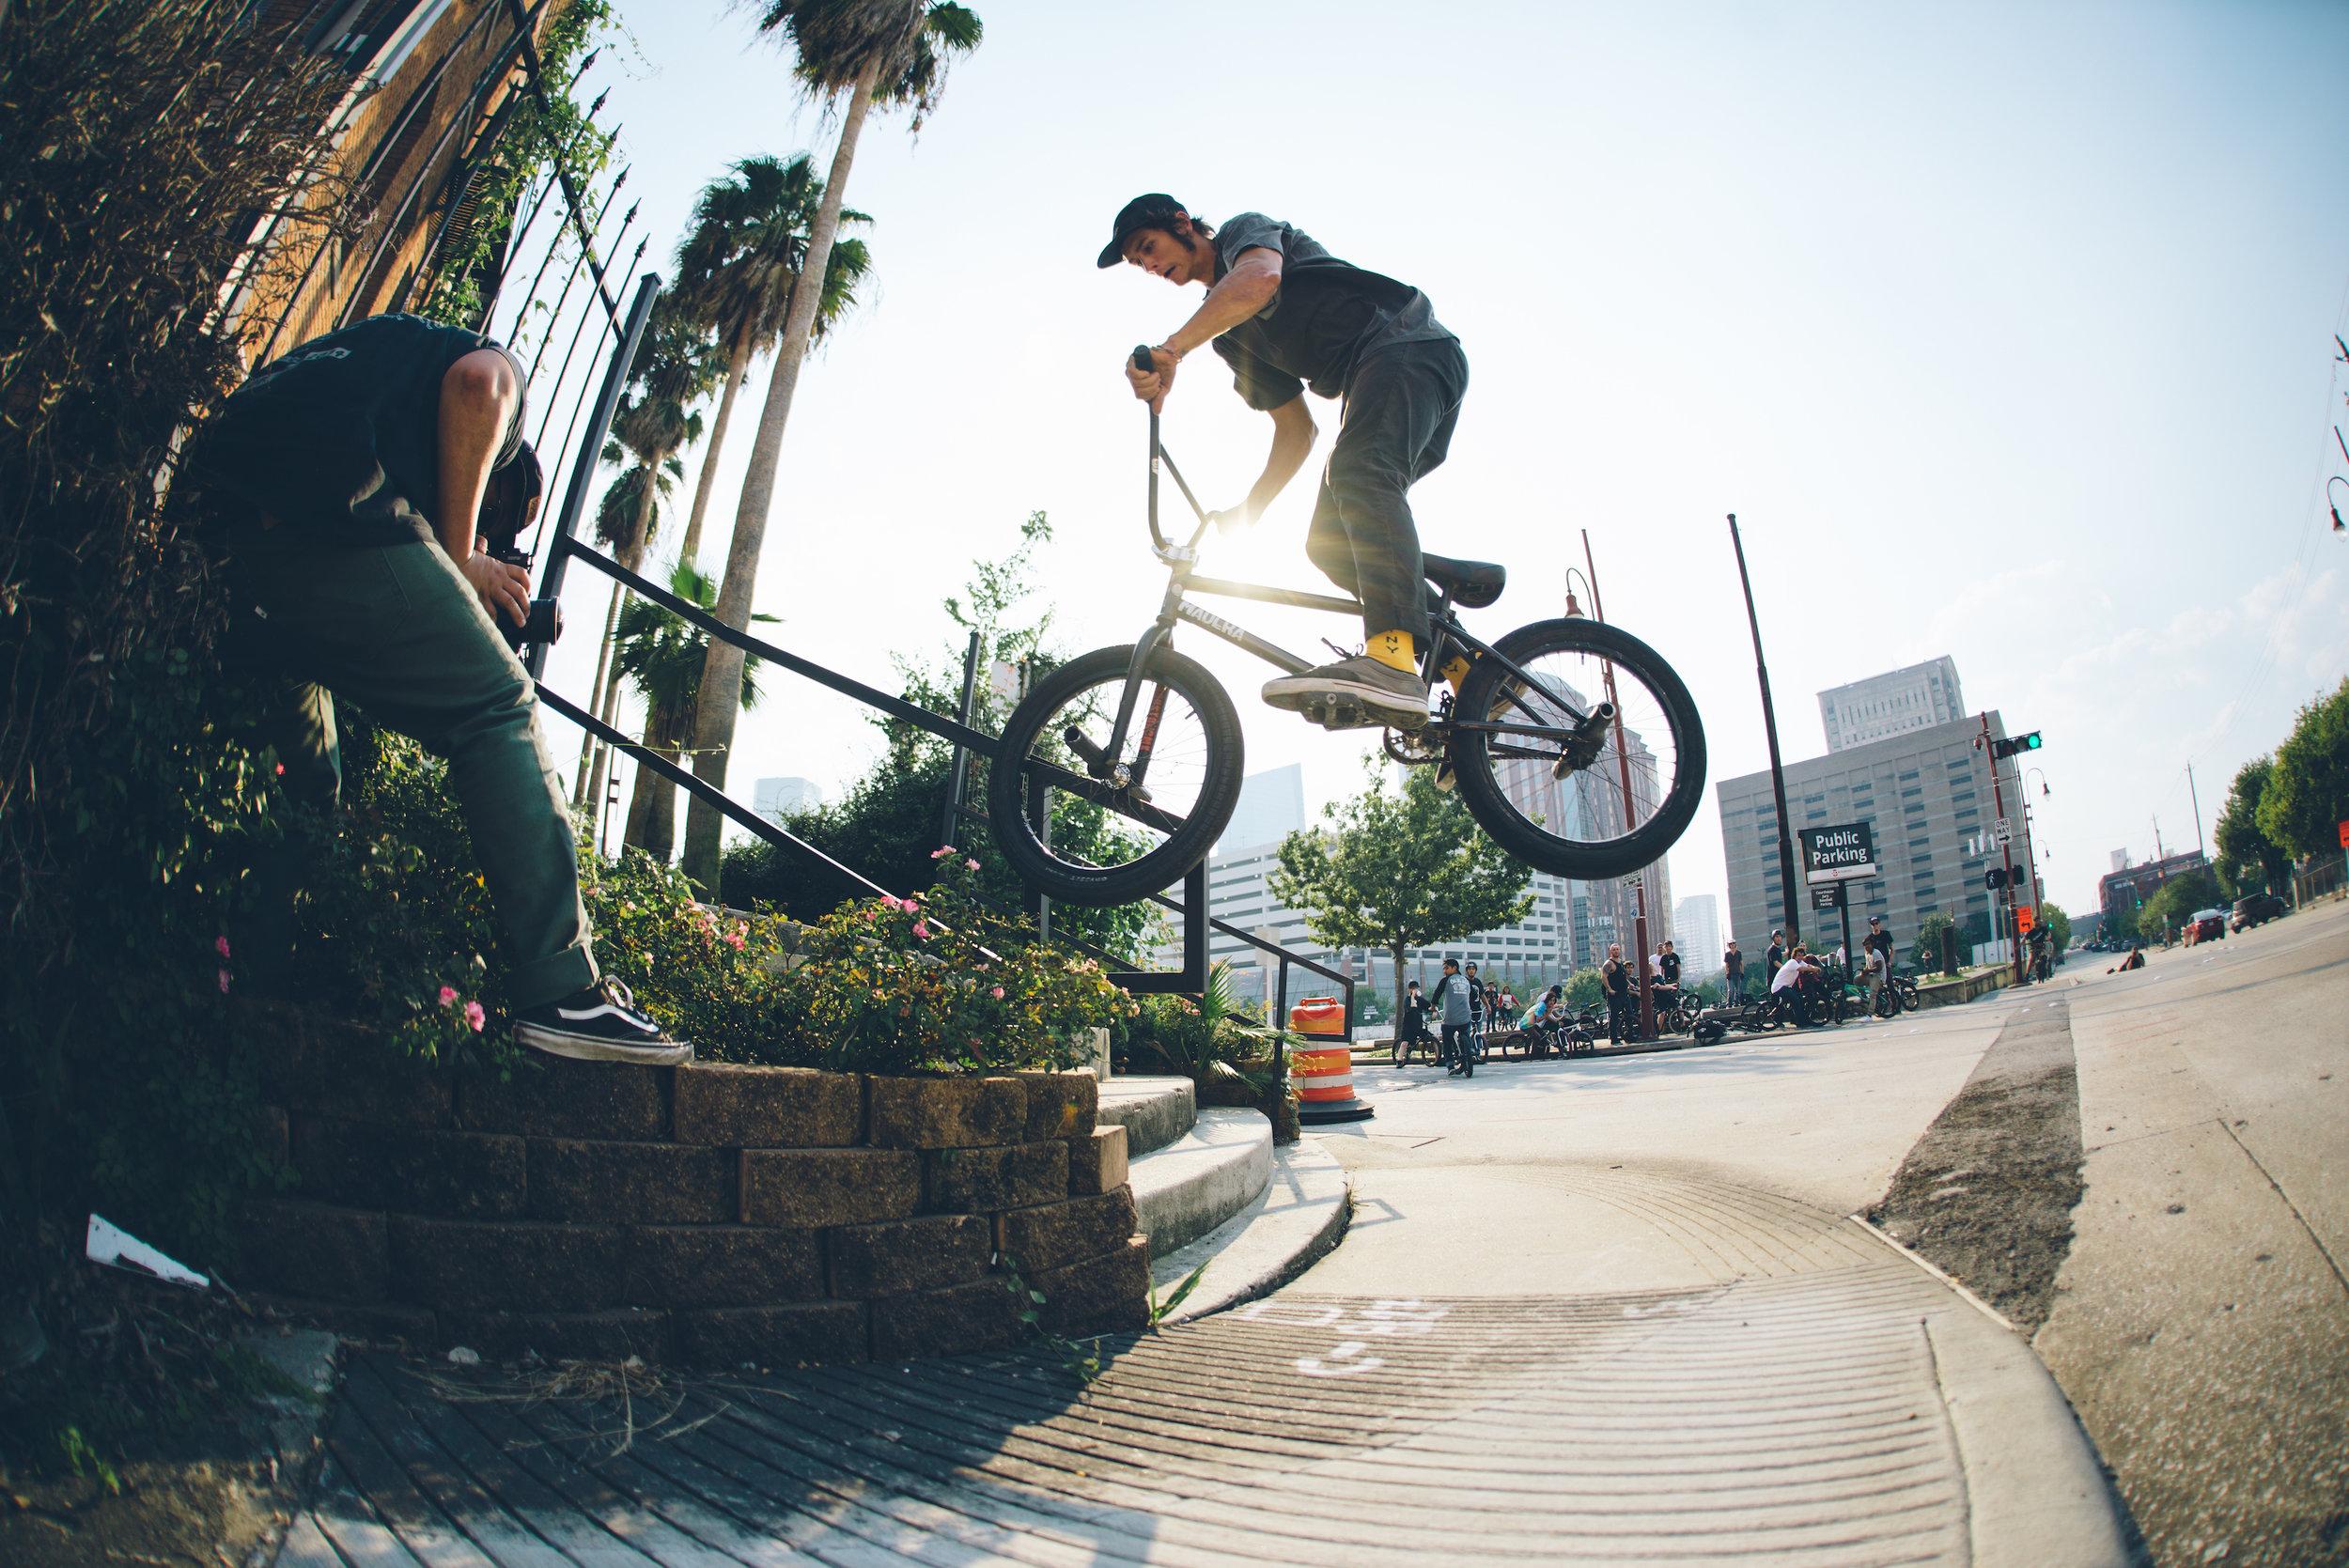 20170910 sunday street ride Kirby Crumpler_half res_8.jpg